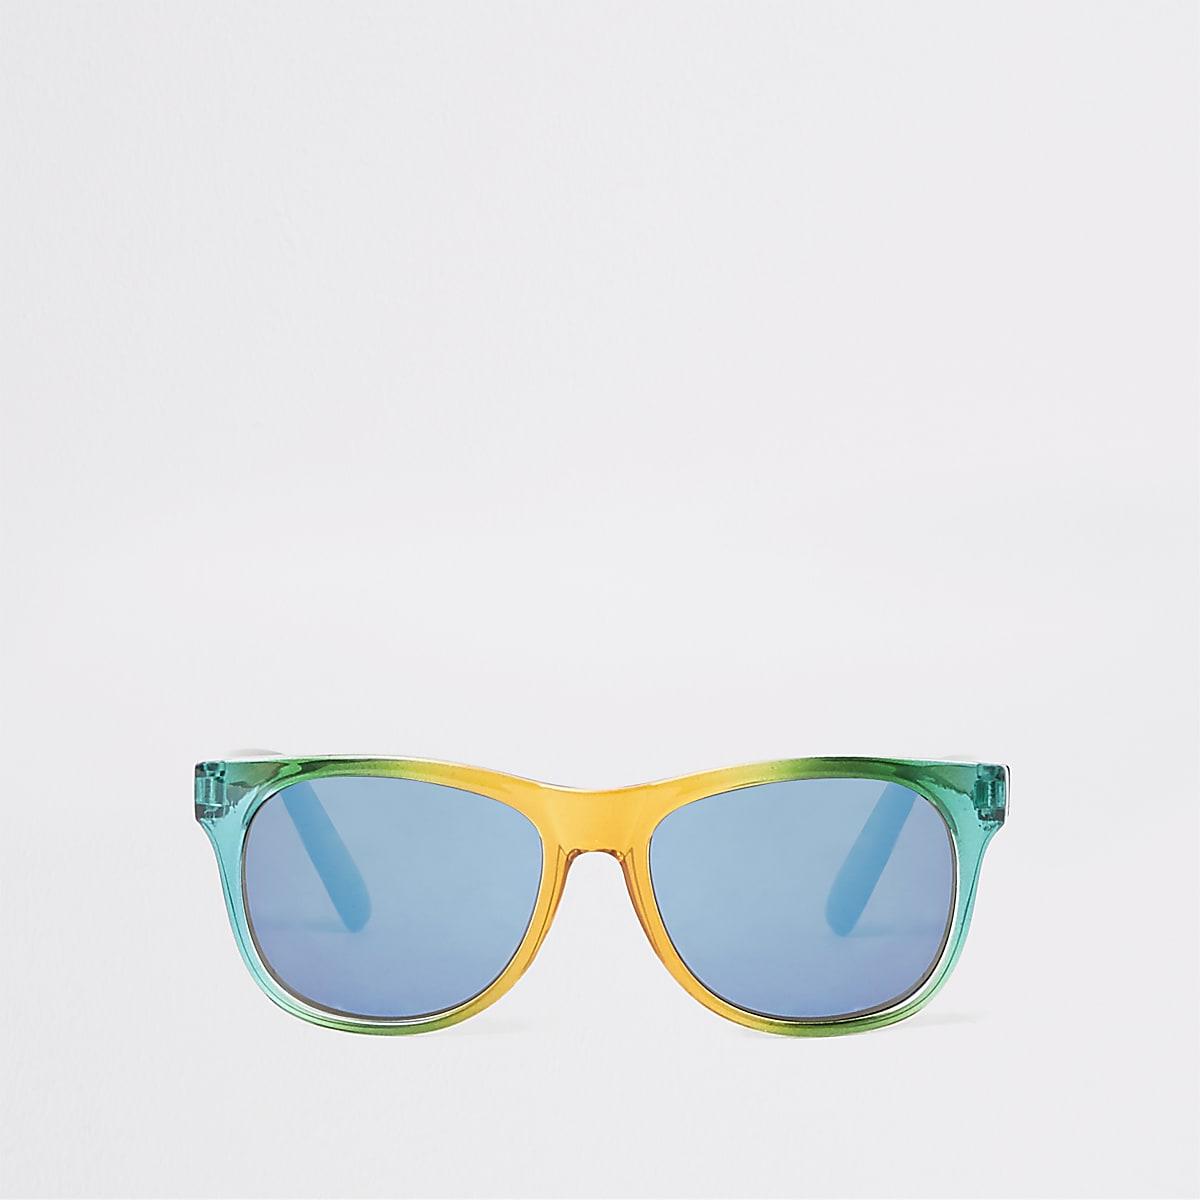 Boys rainbow retro sunglasses